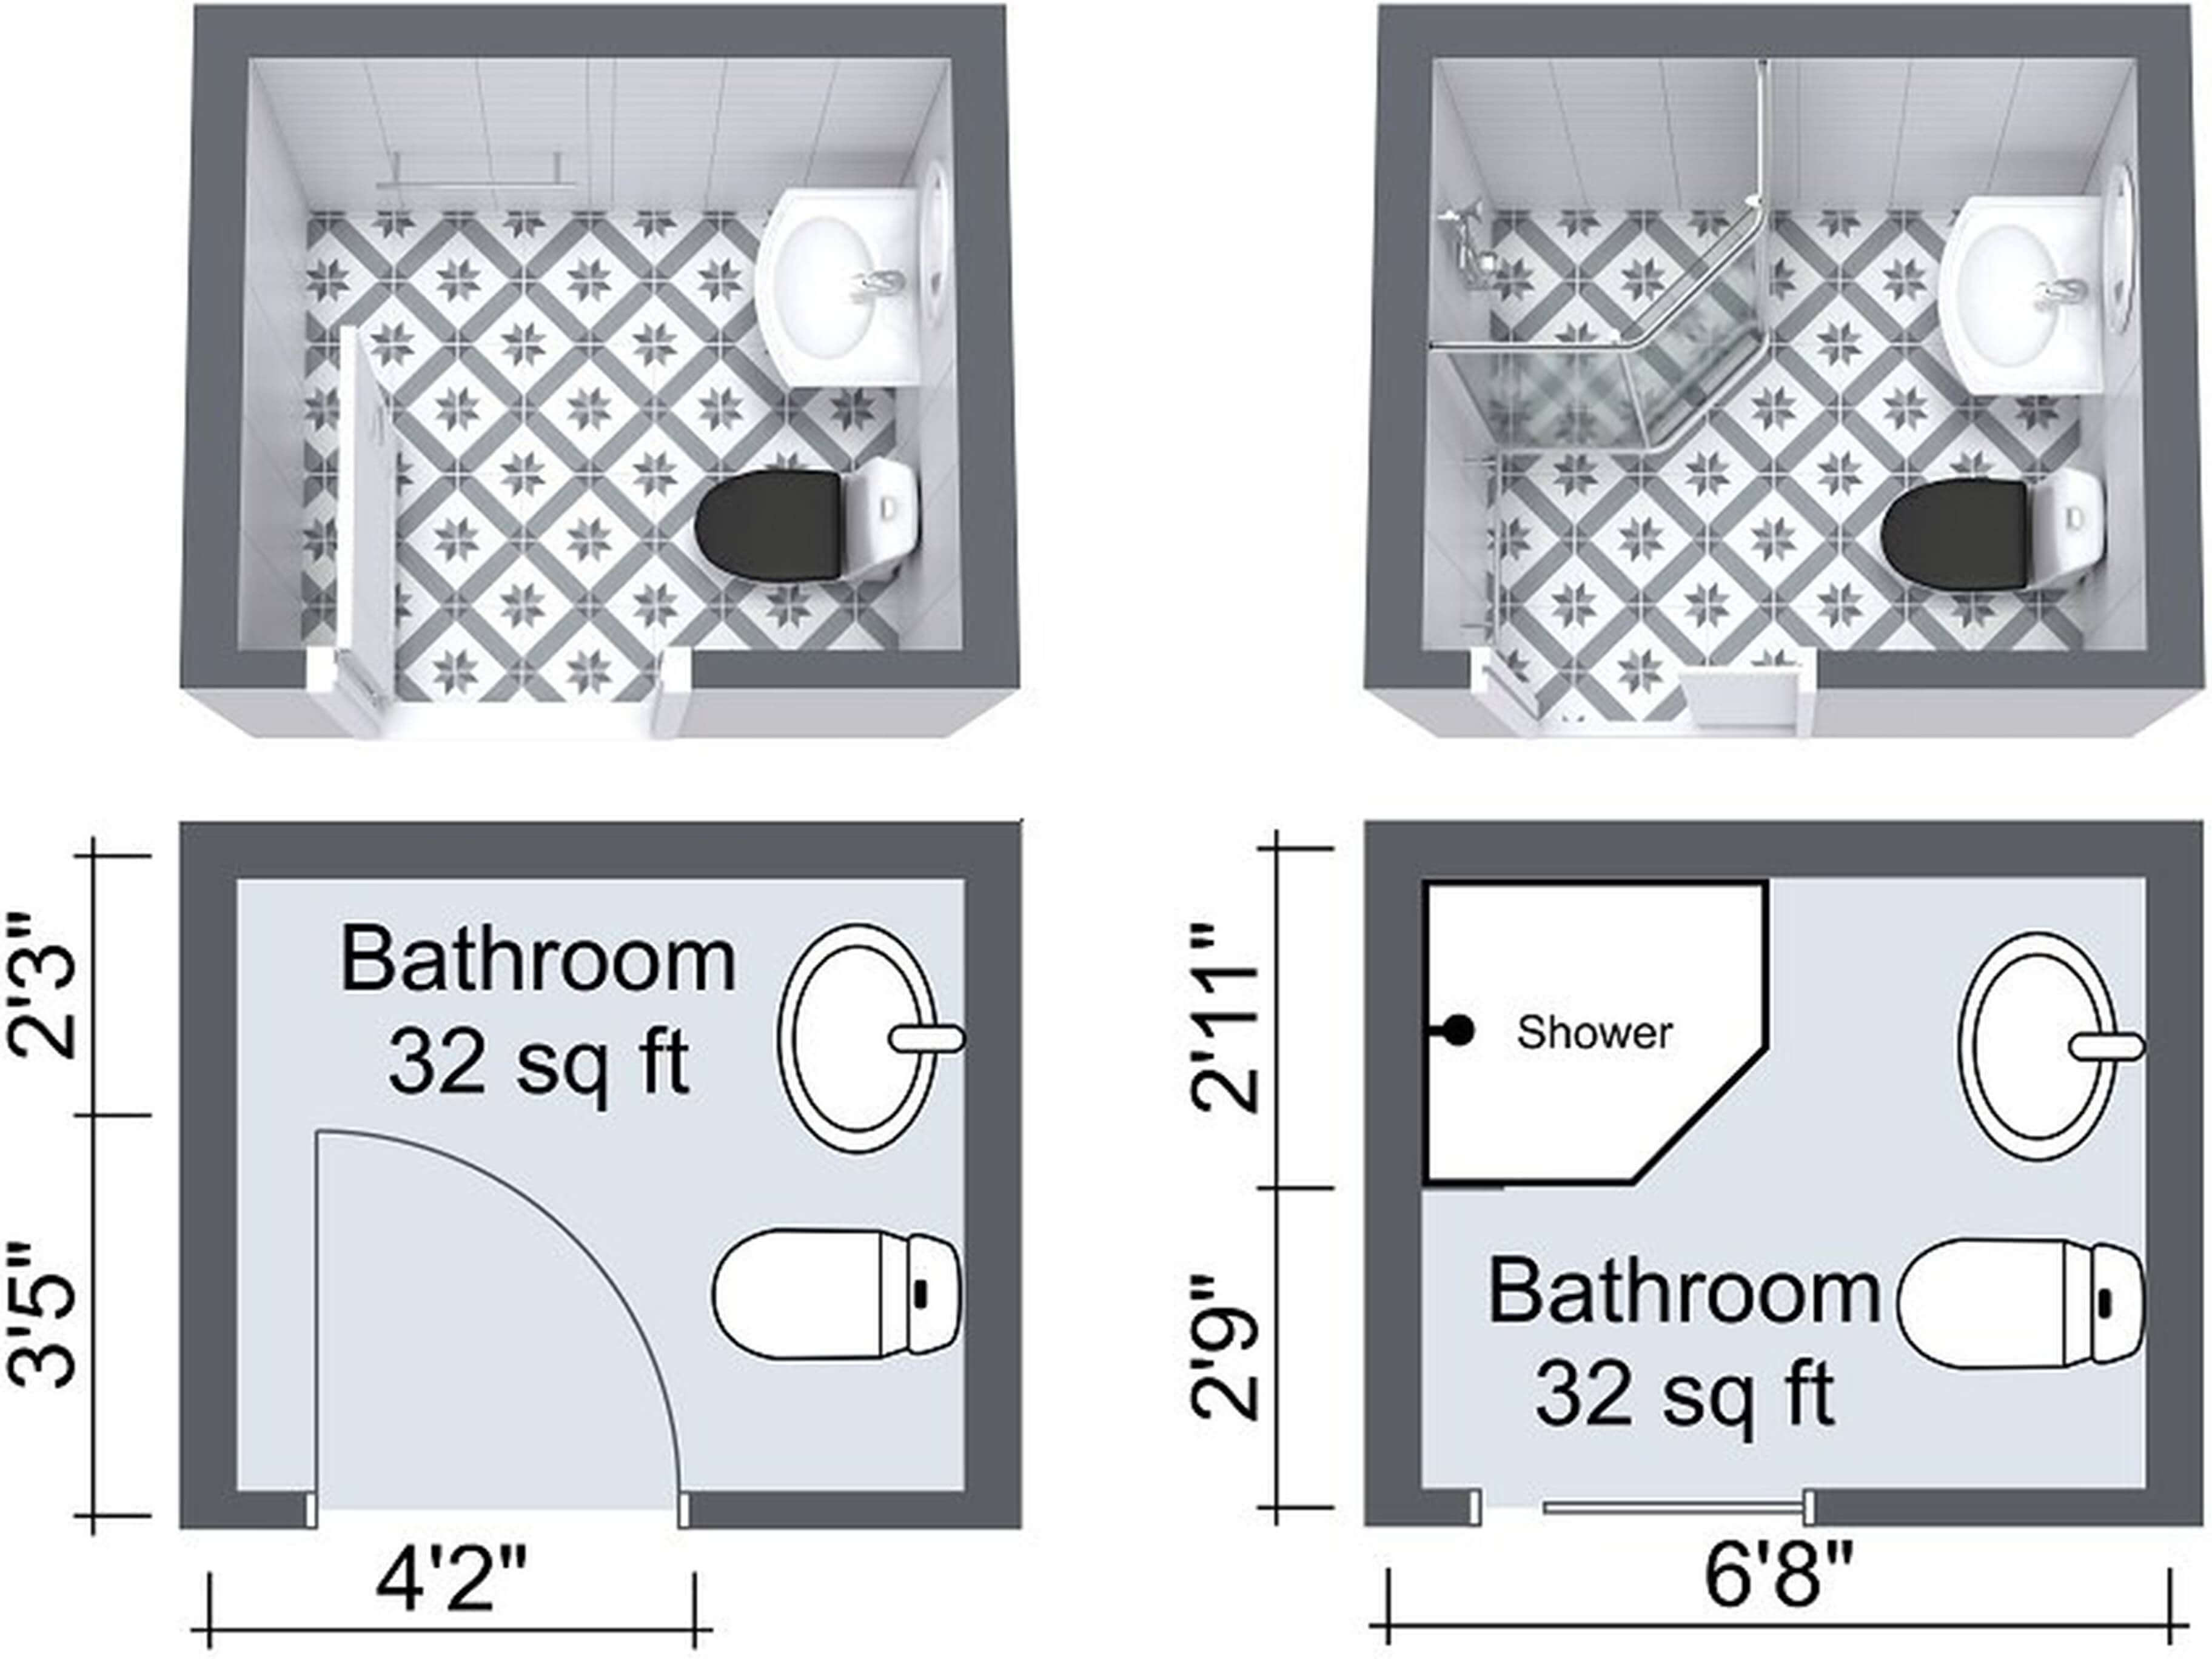 Bathroom Size And E Arrangement